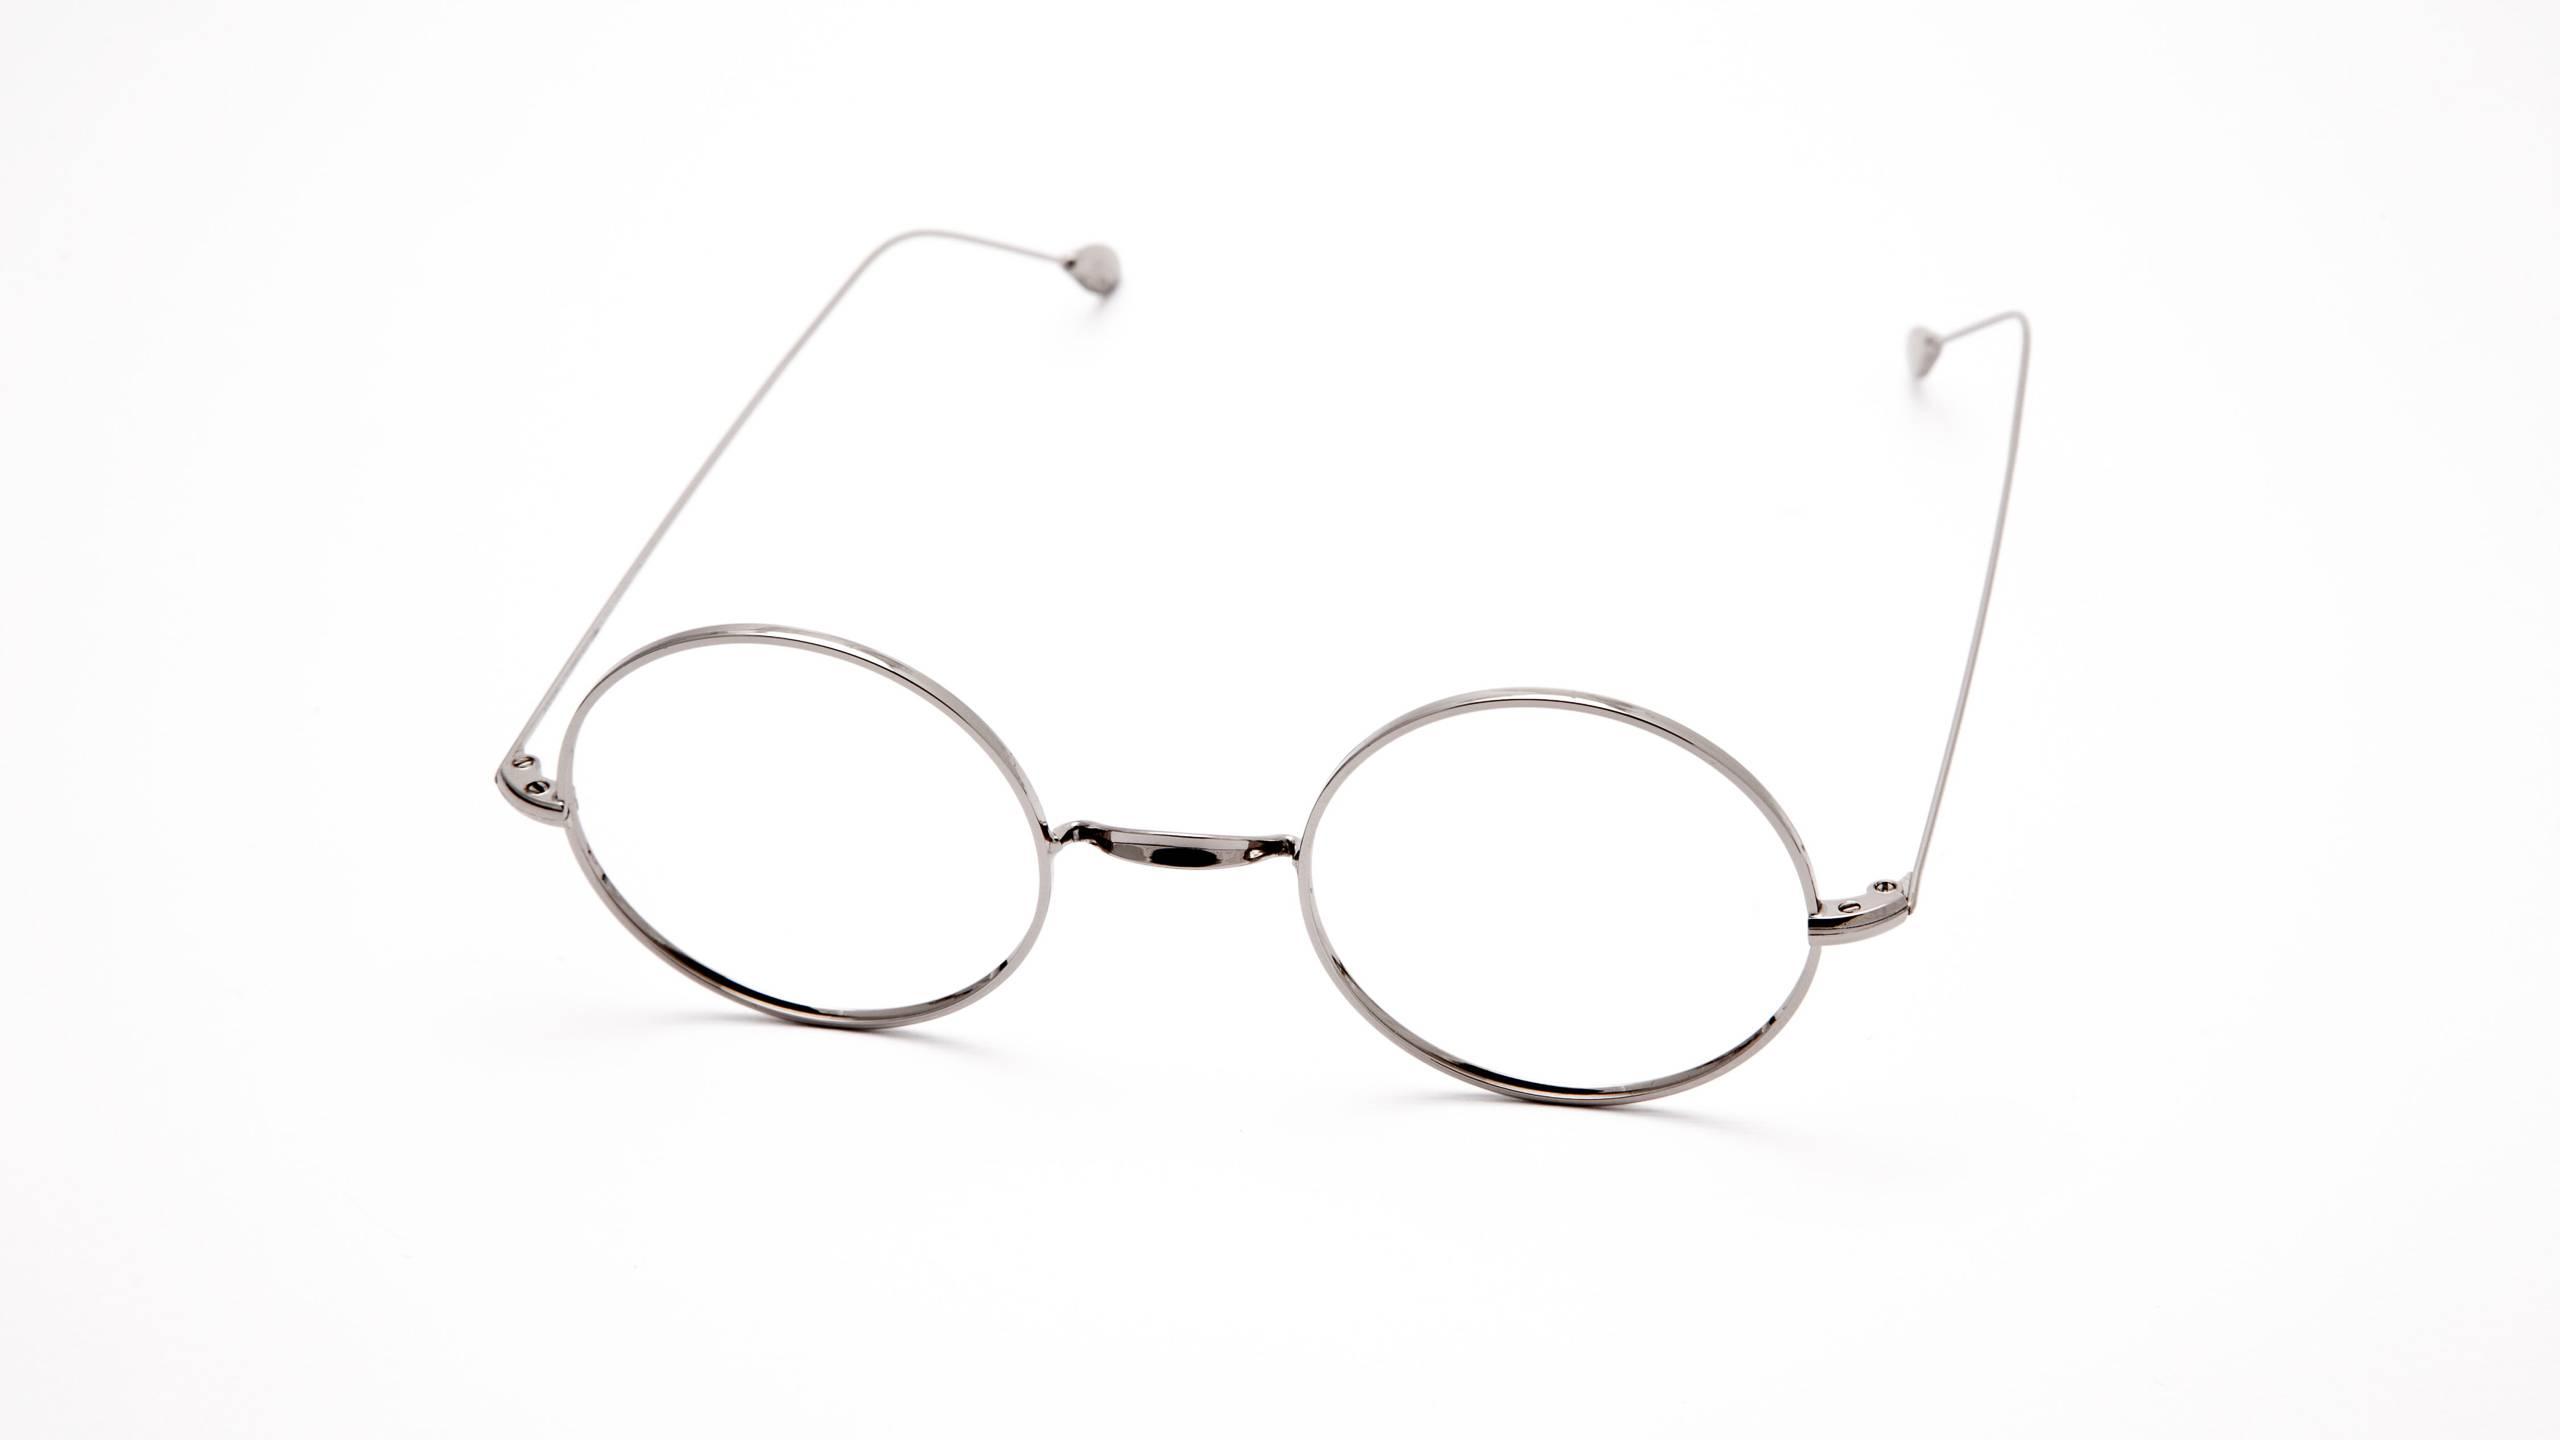 eyeglasses-Nathan-Kaltermann-made-in-Italy-ISCHIA-ARG-UNISEX-VISTA2